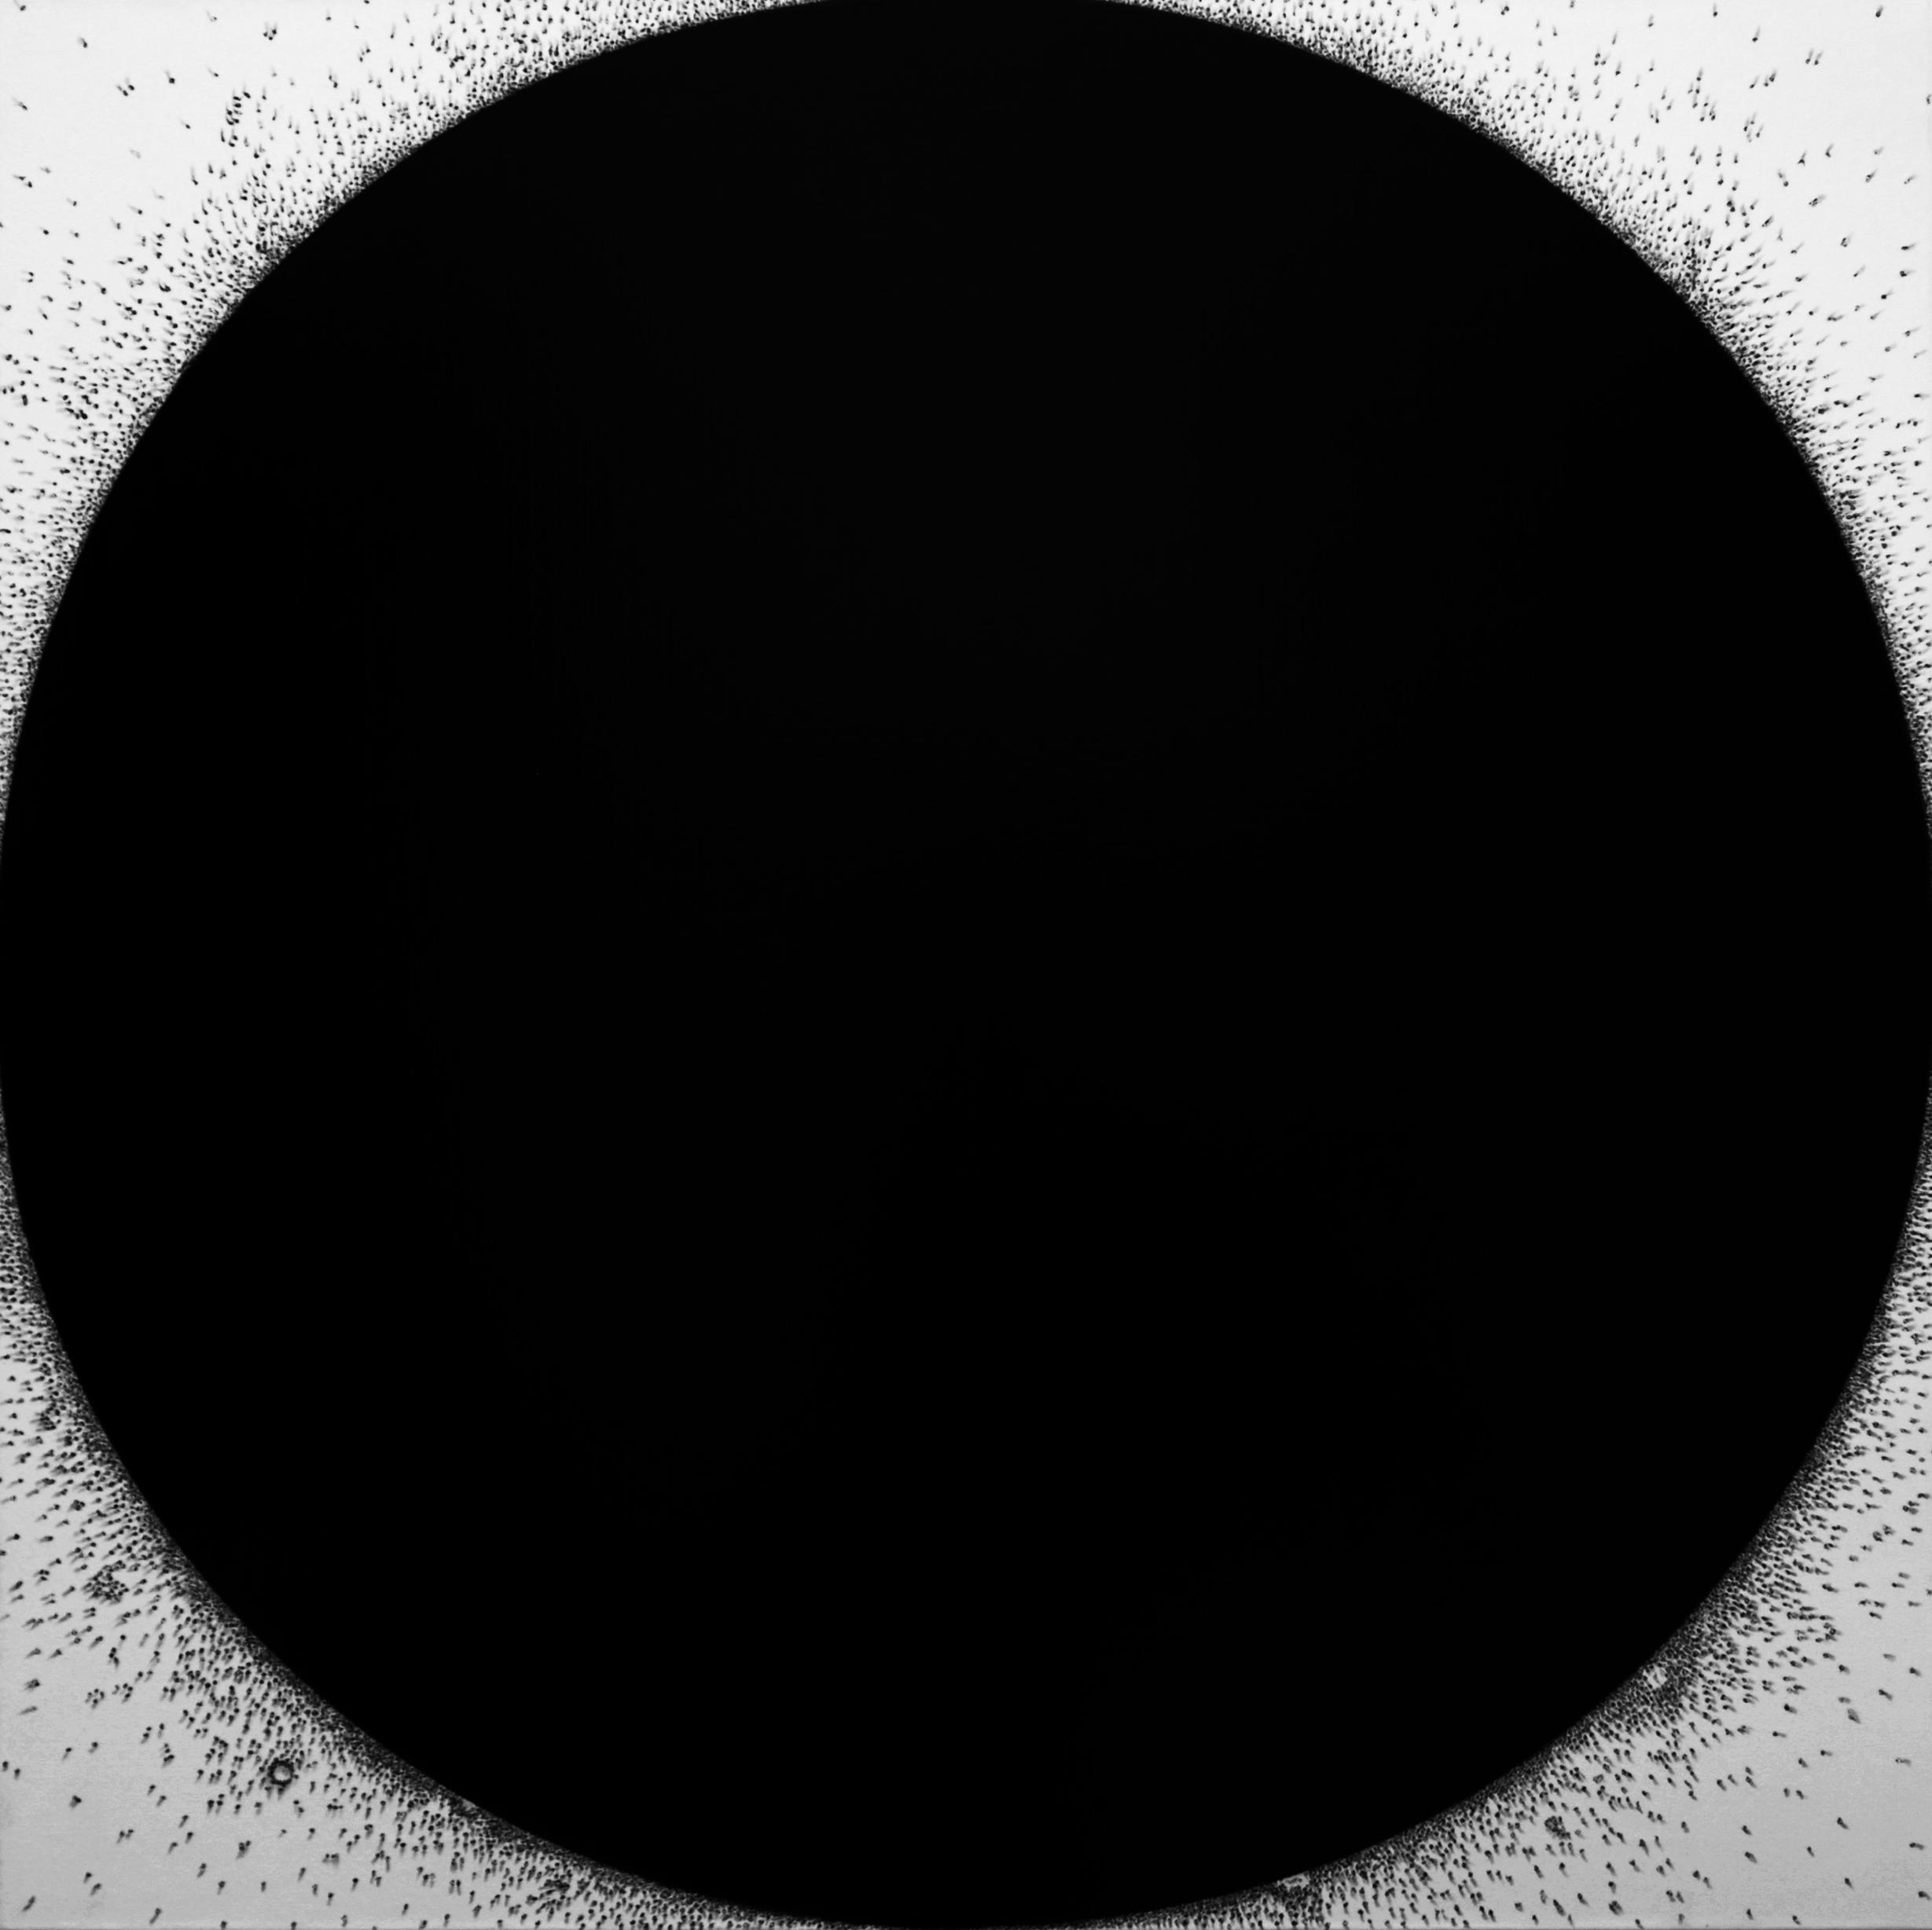 Black Spot Oil on Canvas 120 x 120 cm 47